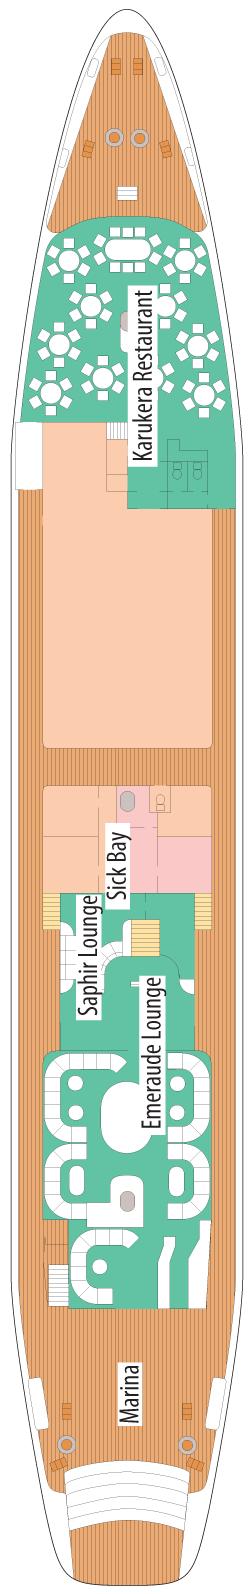 Le Ponant Saint-Barth Deck